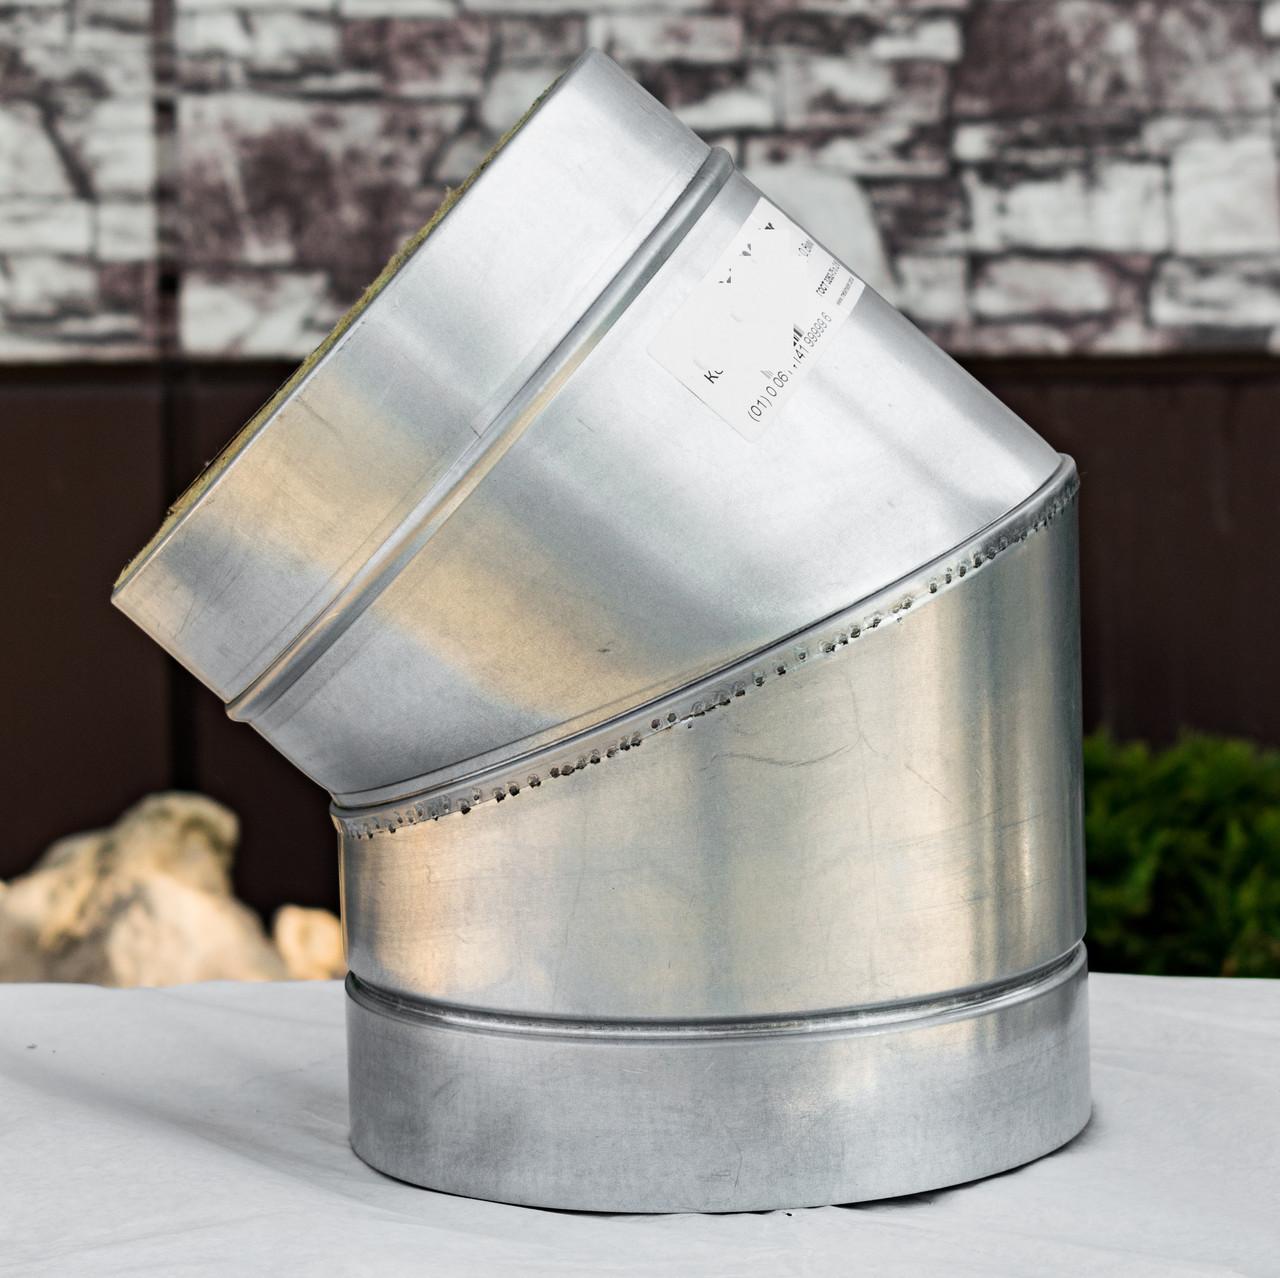 Колено дымохода 45° нерж/оц 1 мм 130/200